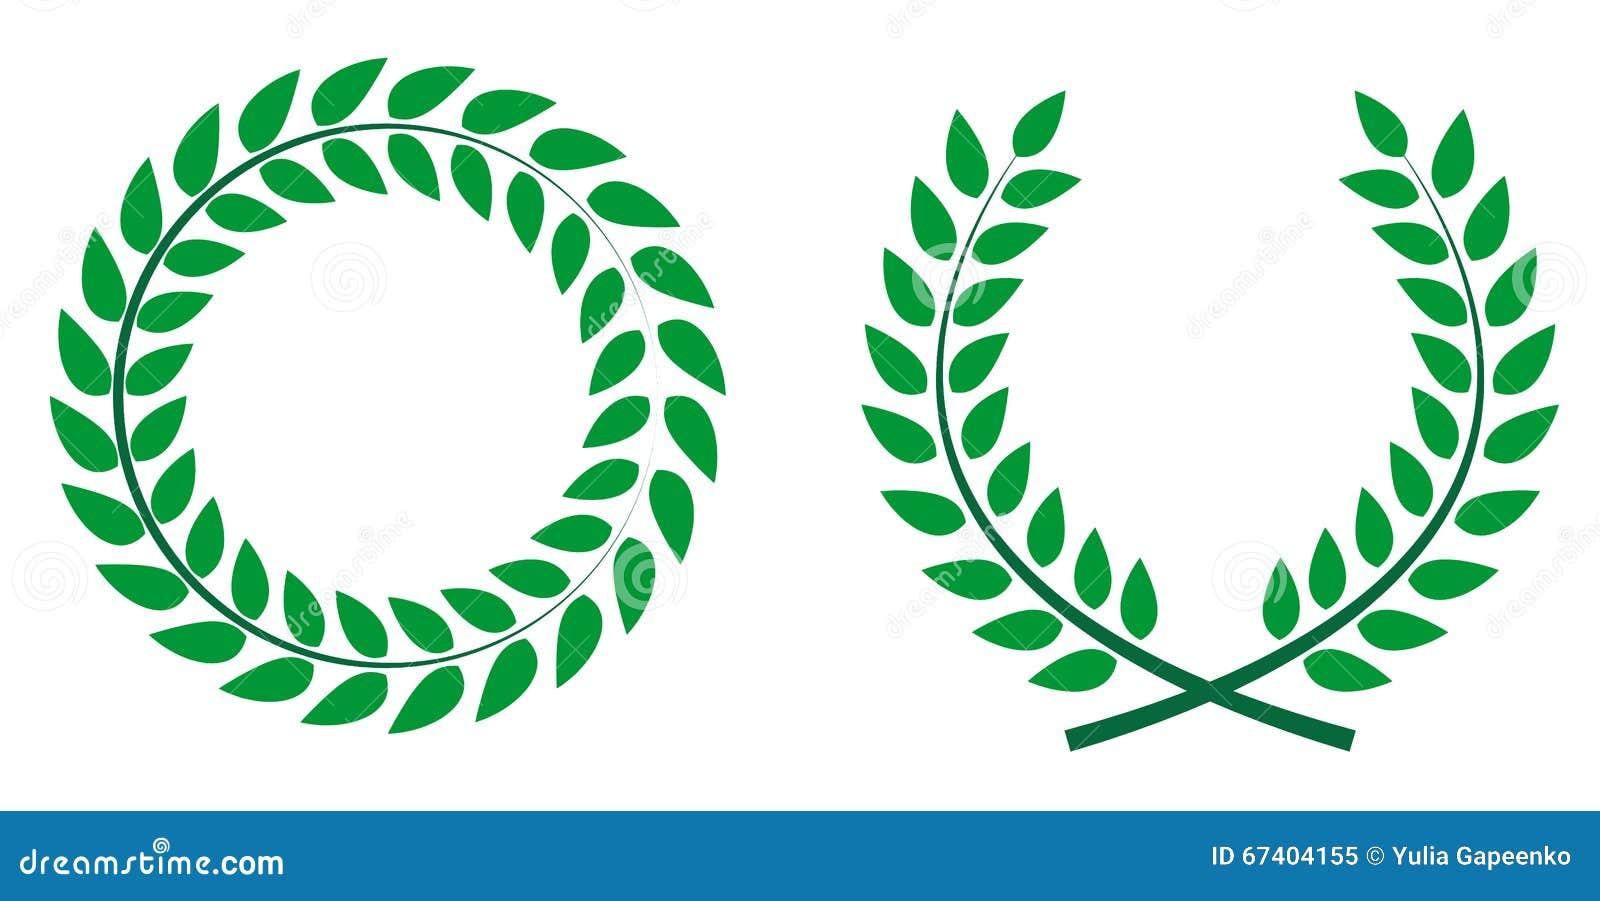 Laurel wreath award stock vector illustration of rome 48801667 winner leaf label symbol of victory vect royalty free stock biocorpaavc